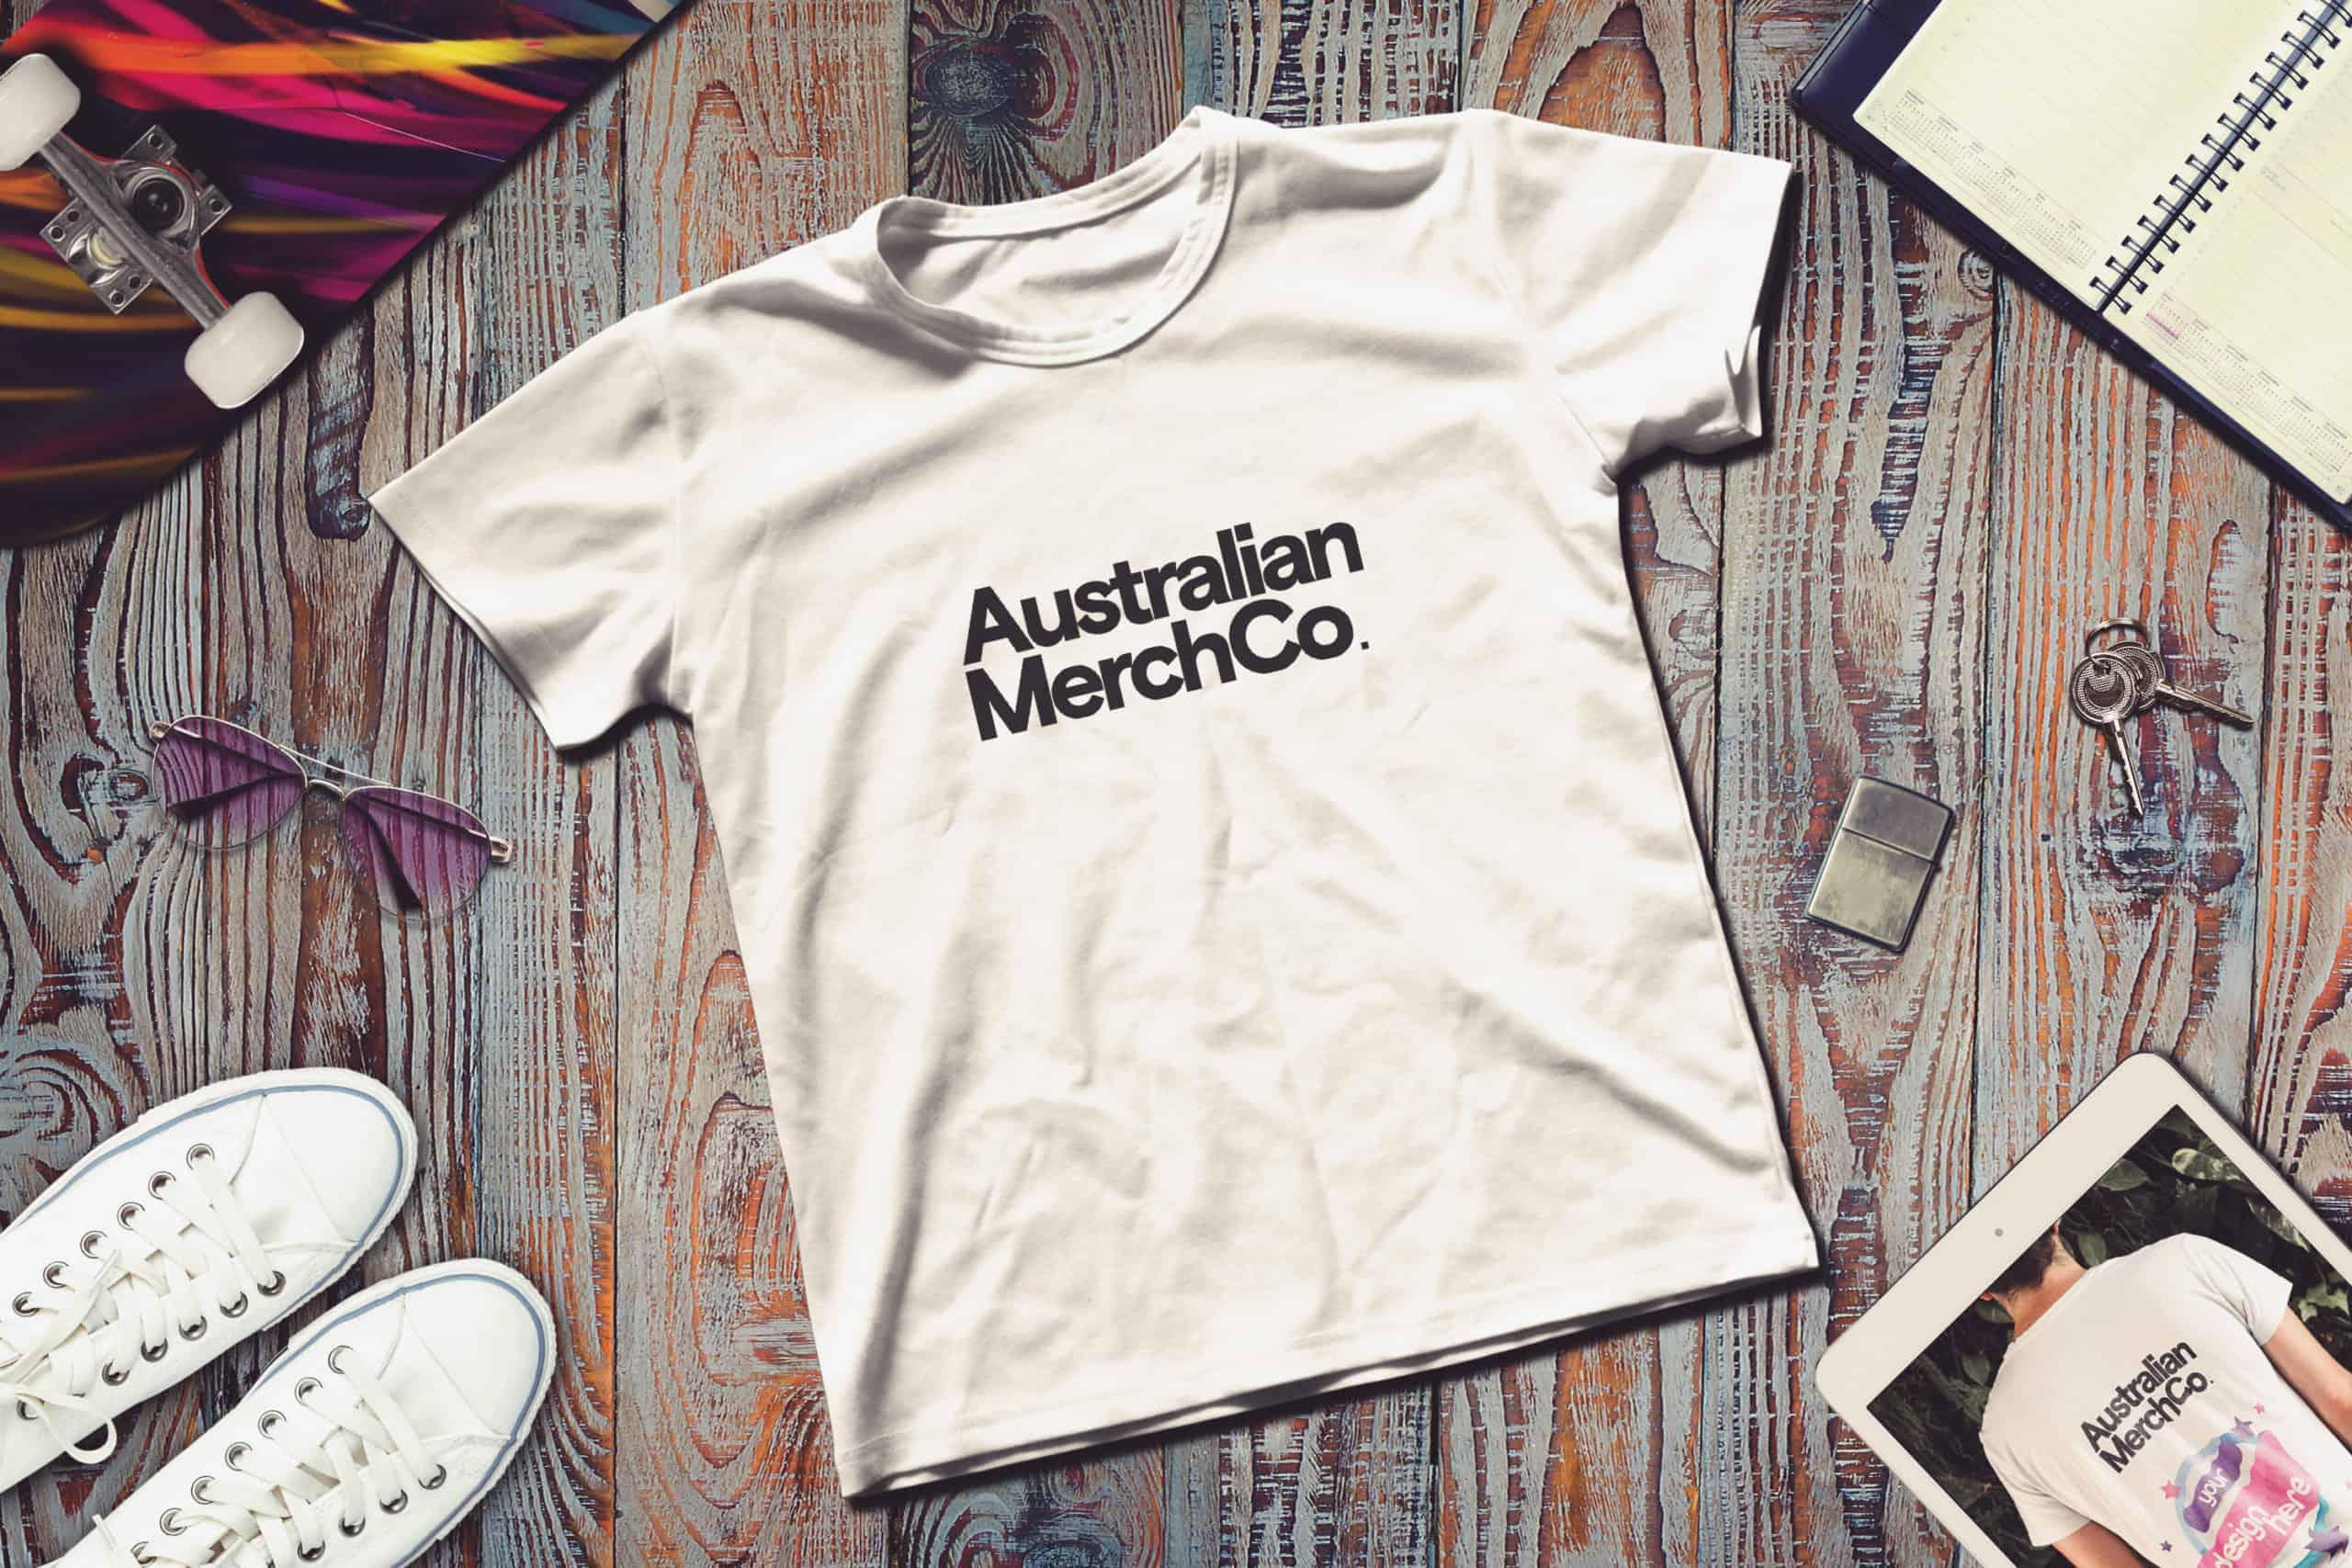 australian merch co screen printing melbourne